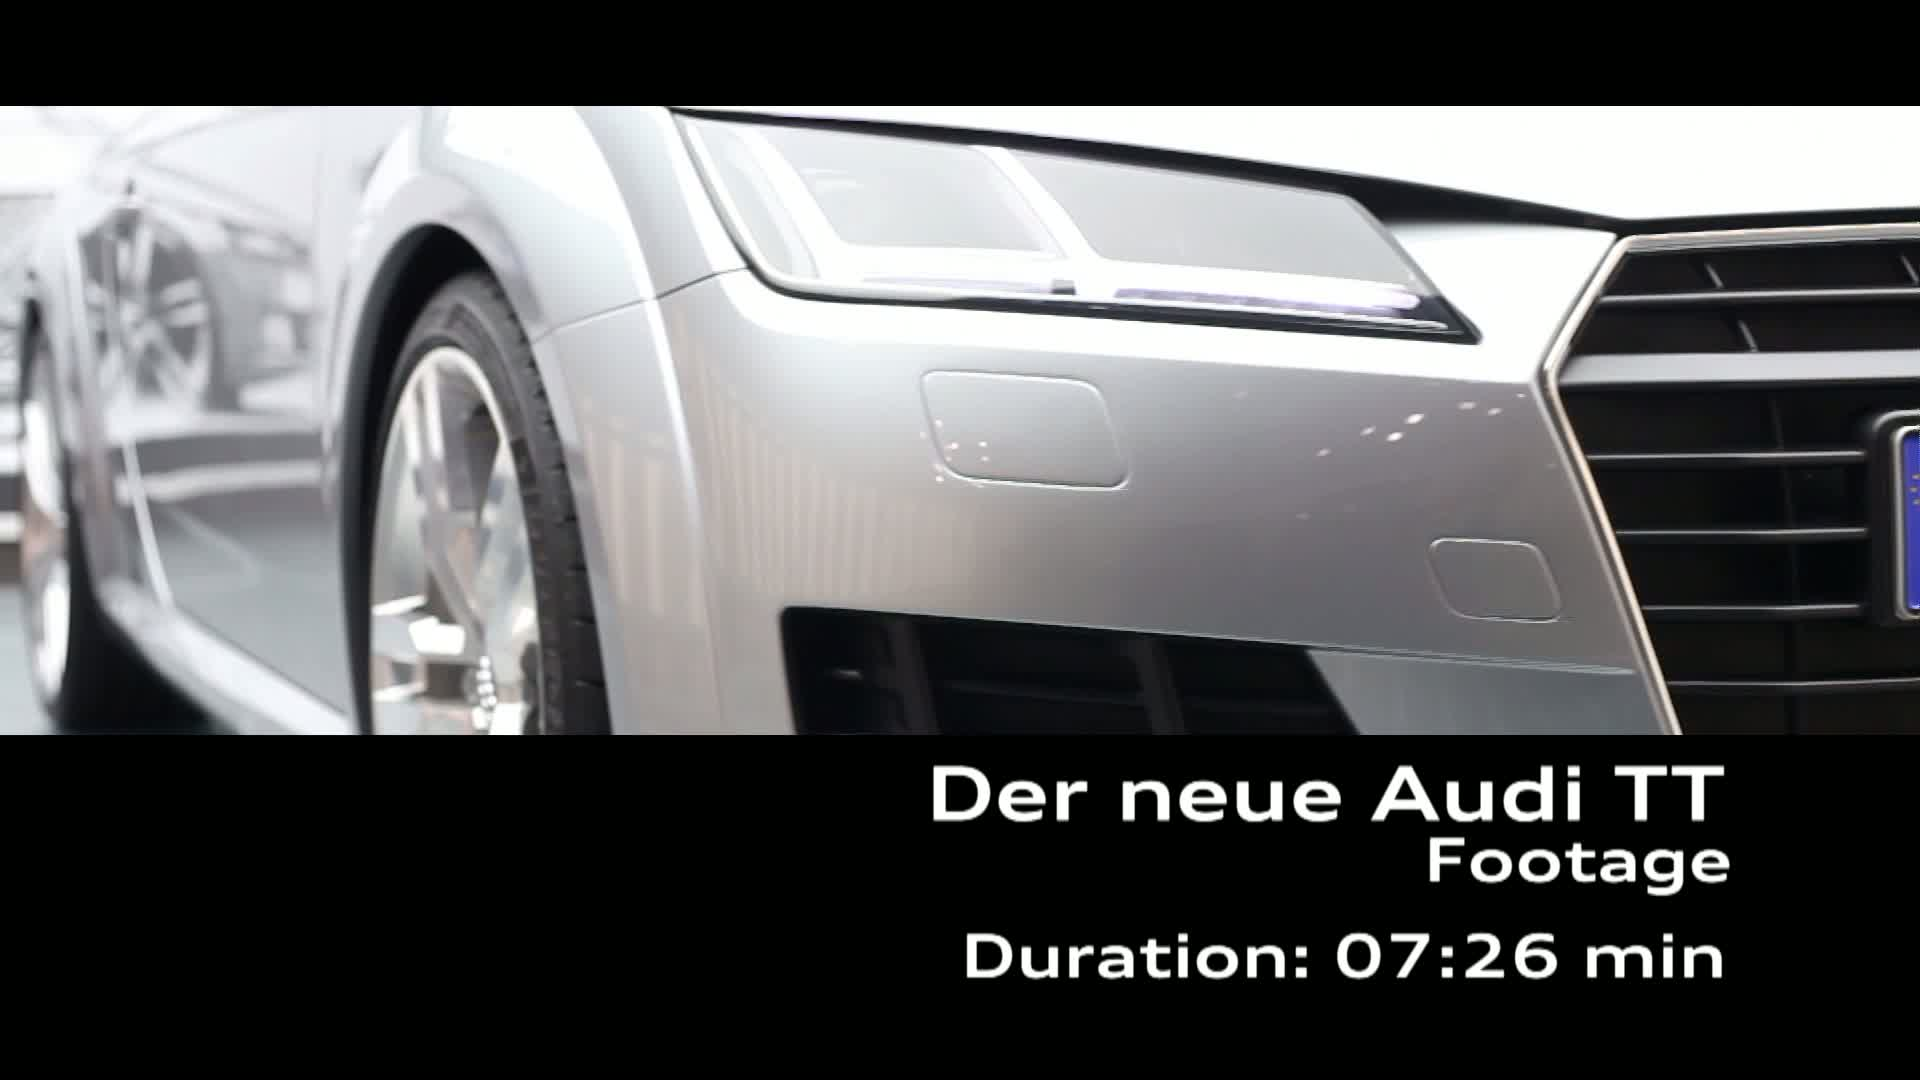 Audi TT Coupé and Audi TTS Coupé Design - Footage